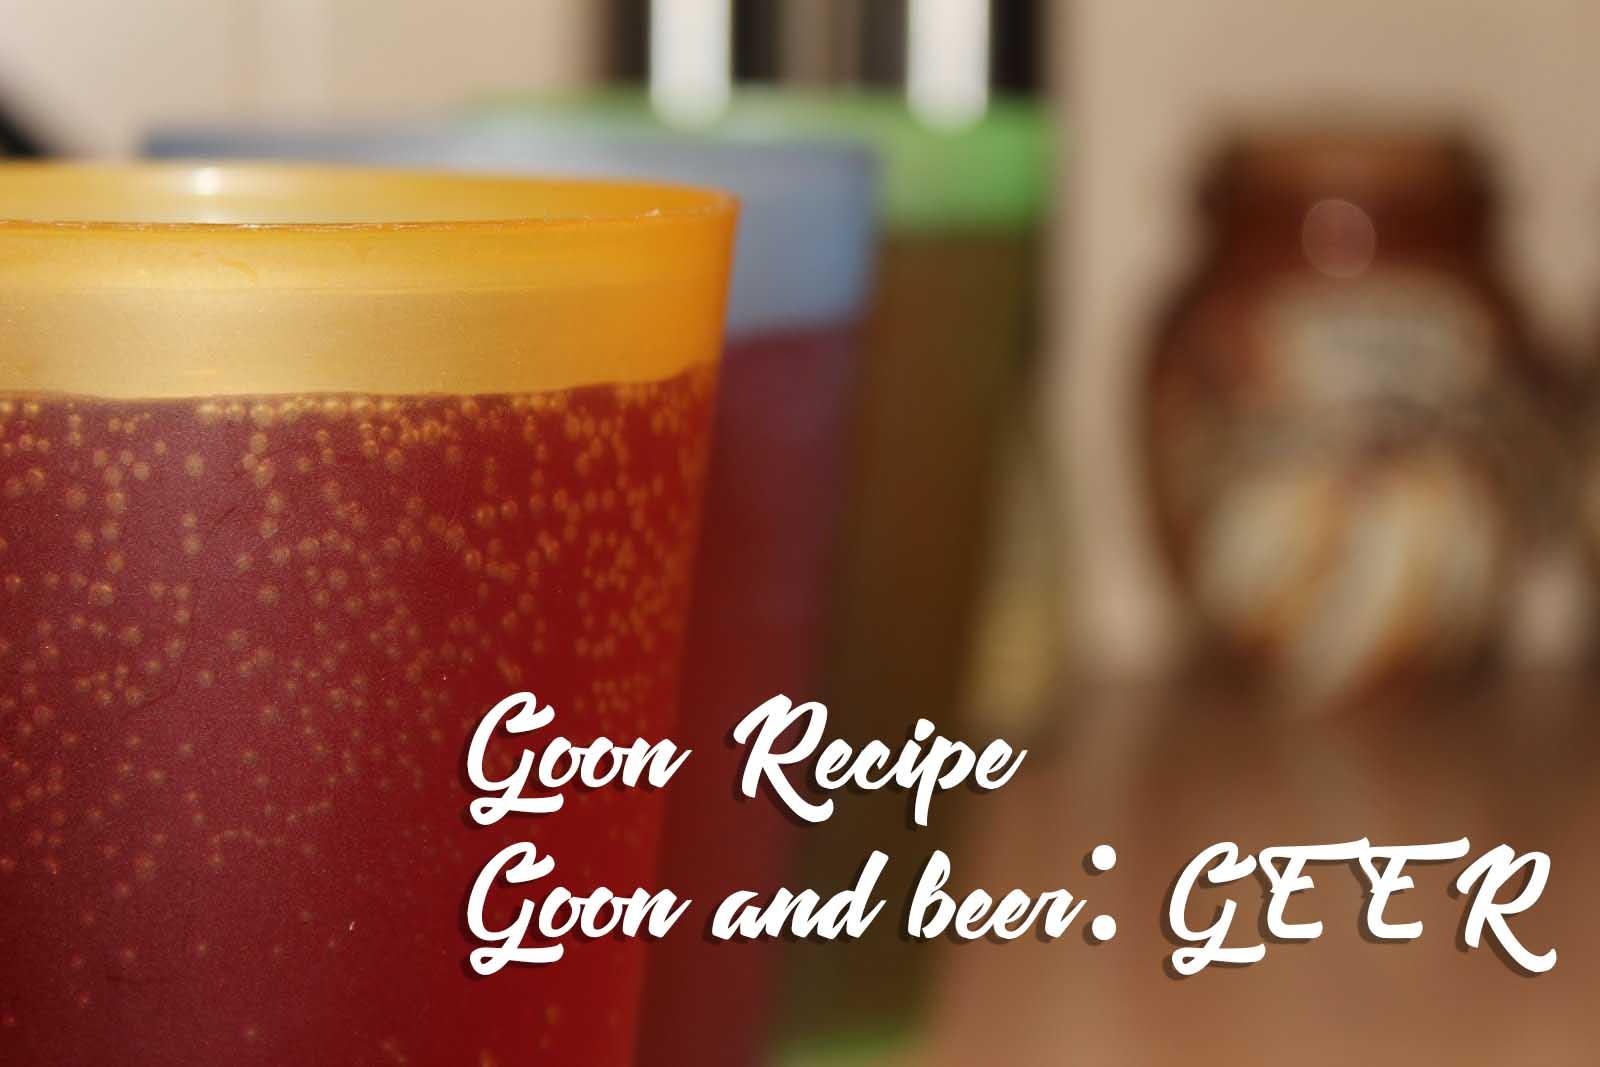 Goon_(Box_Wine)_and_Beer_Mix_Goon_Recipe